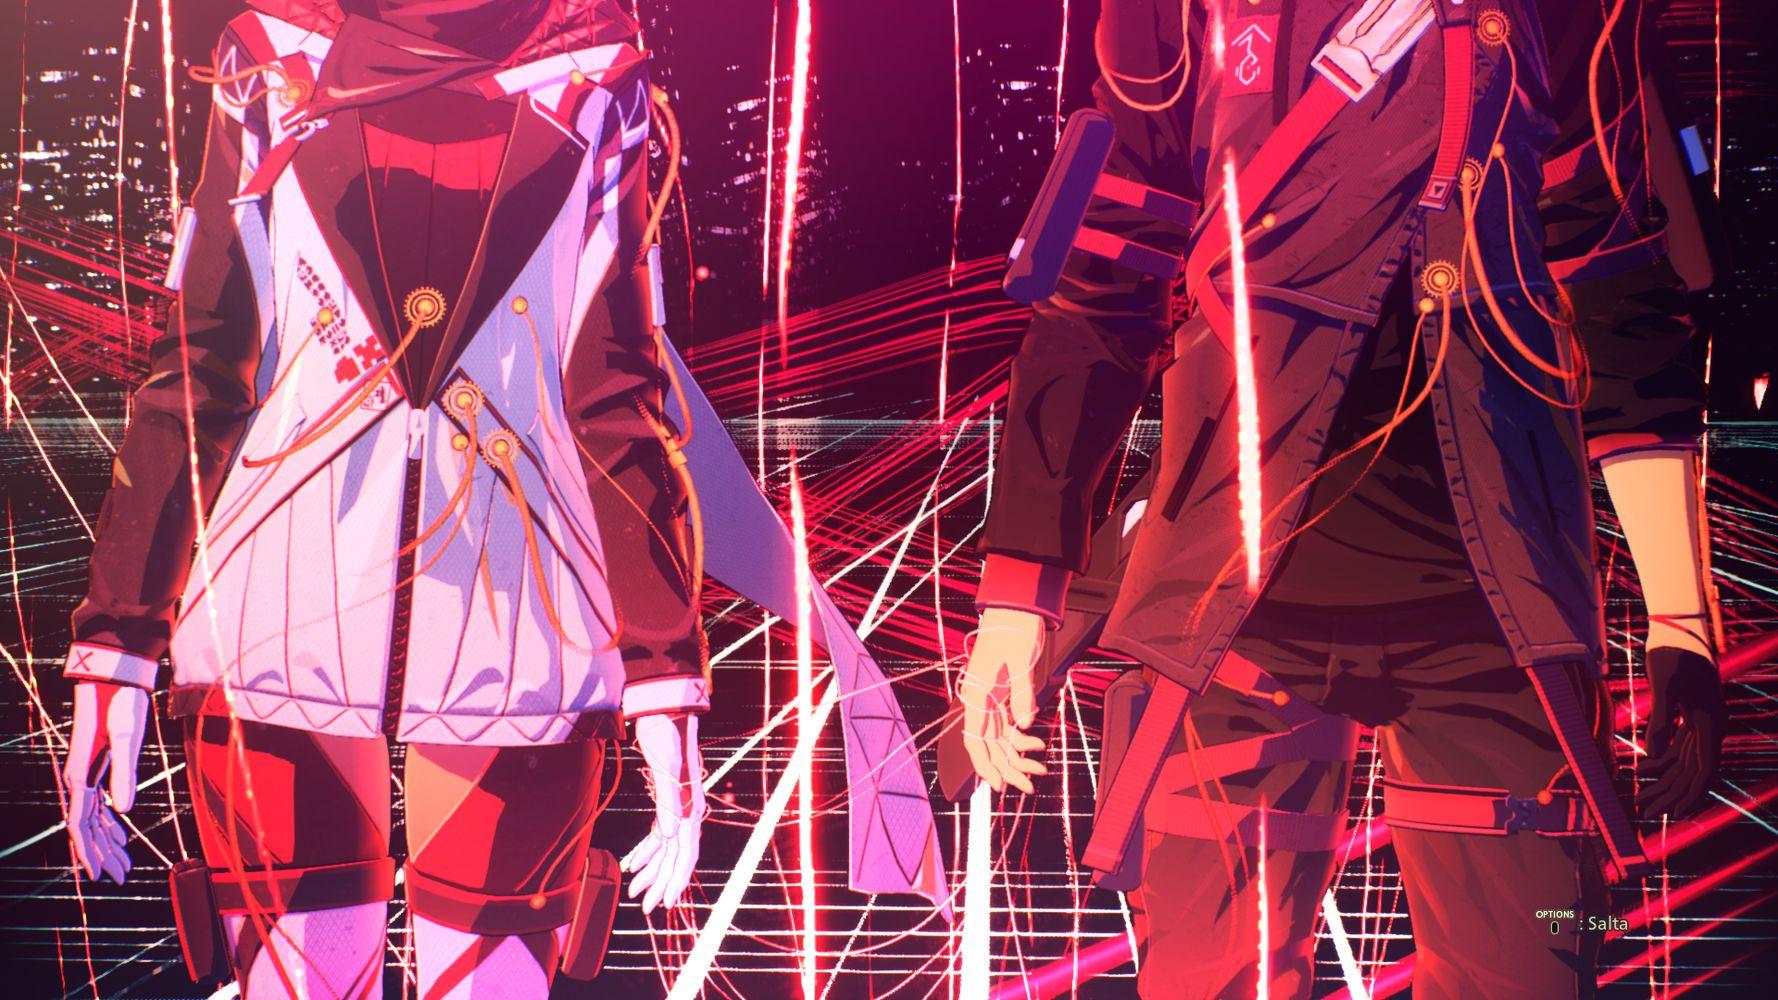 Yuito e Kasane, i due protagonisti di SCARLET NEXUS